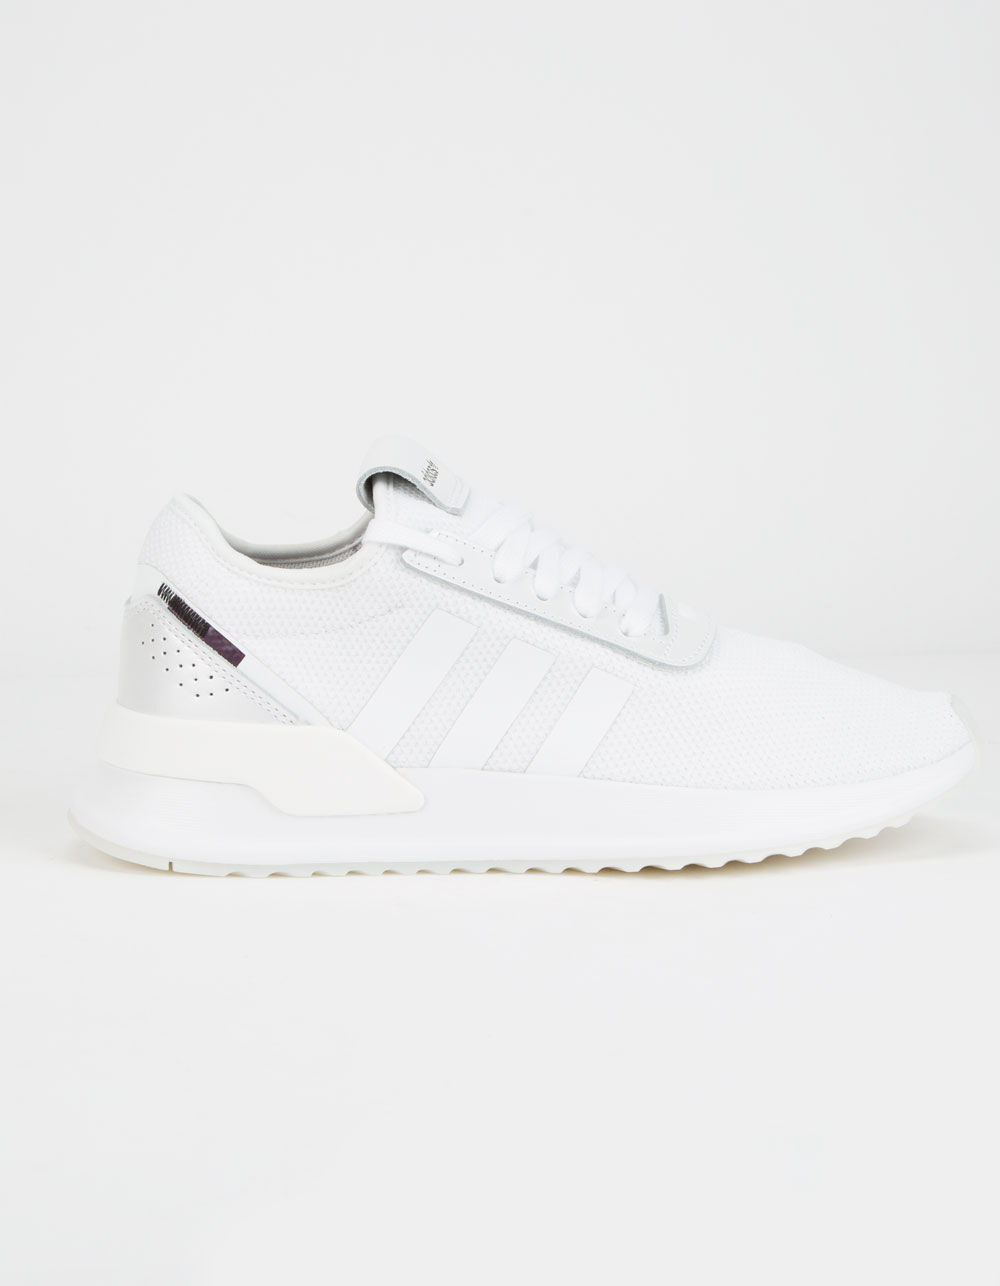 ADIDAS U_Path X Cloud White Shoes